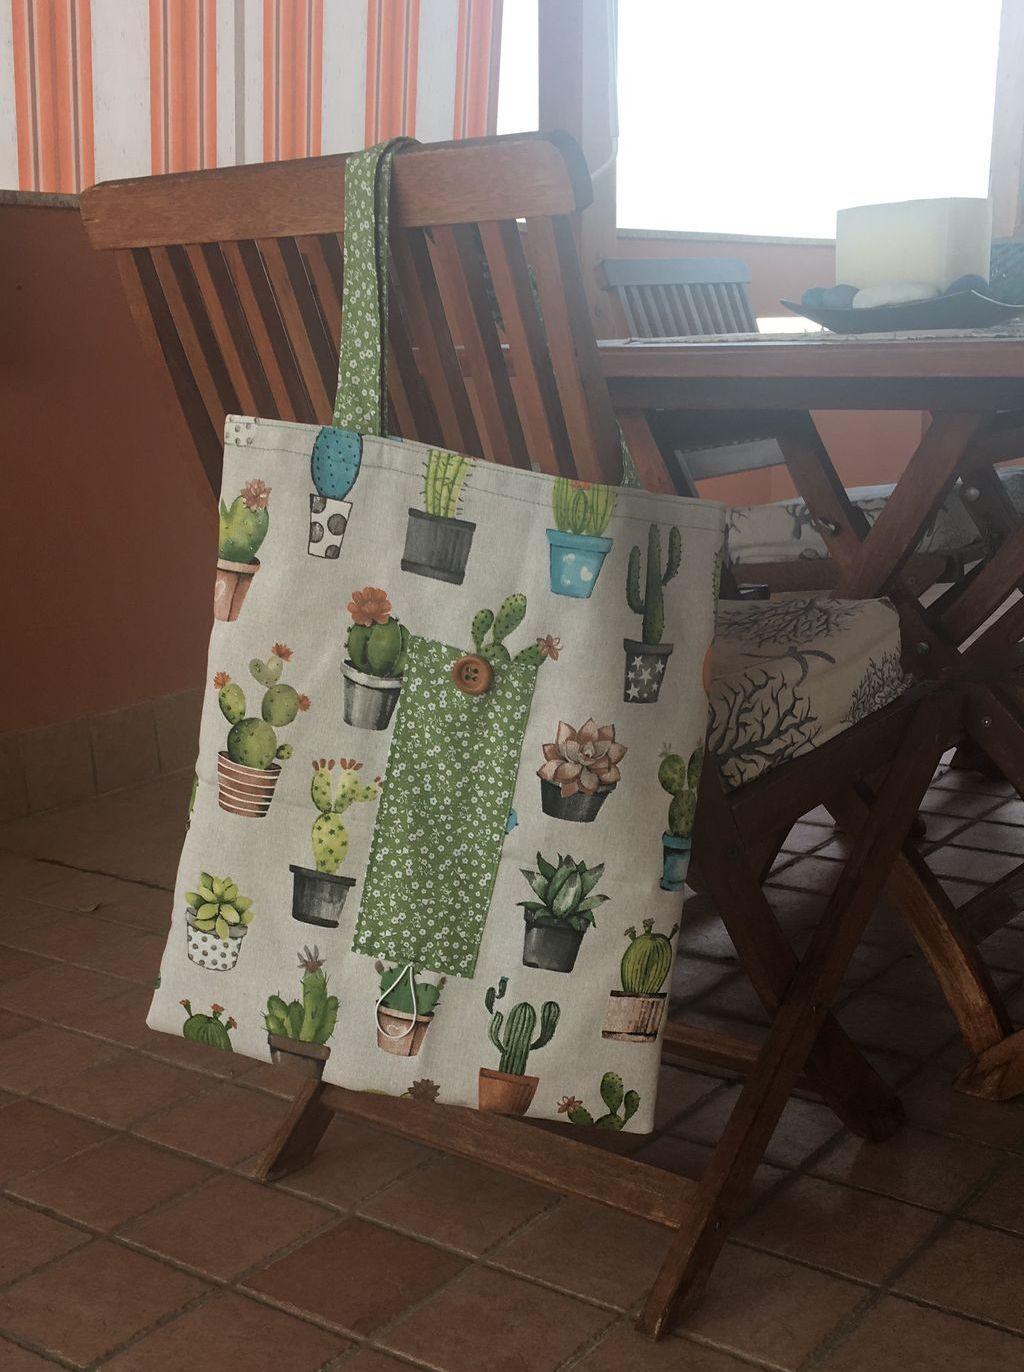 Shopping Bag cactus - Shopping Bag cactus